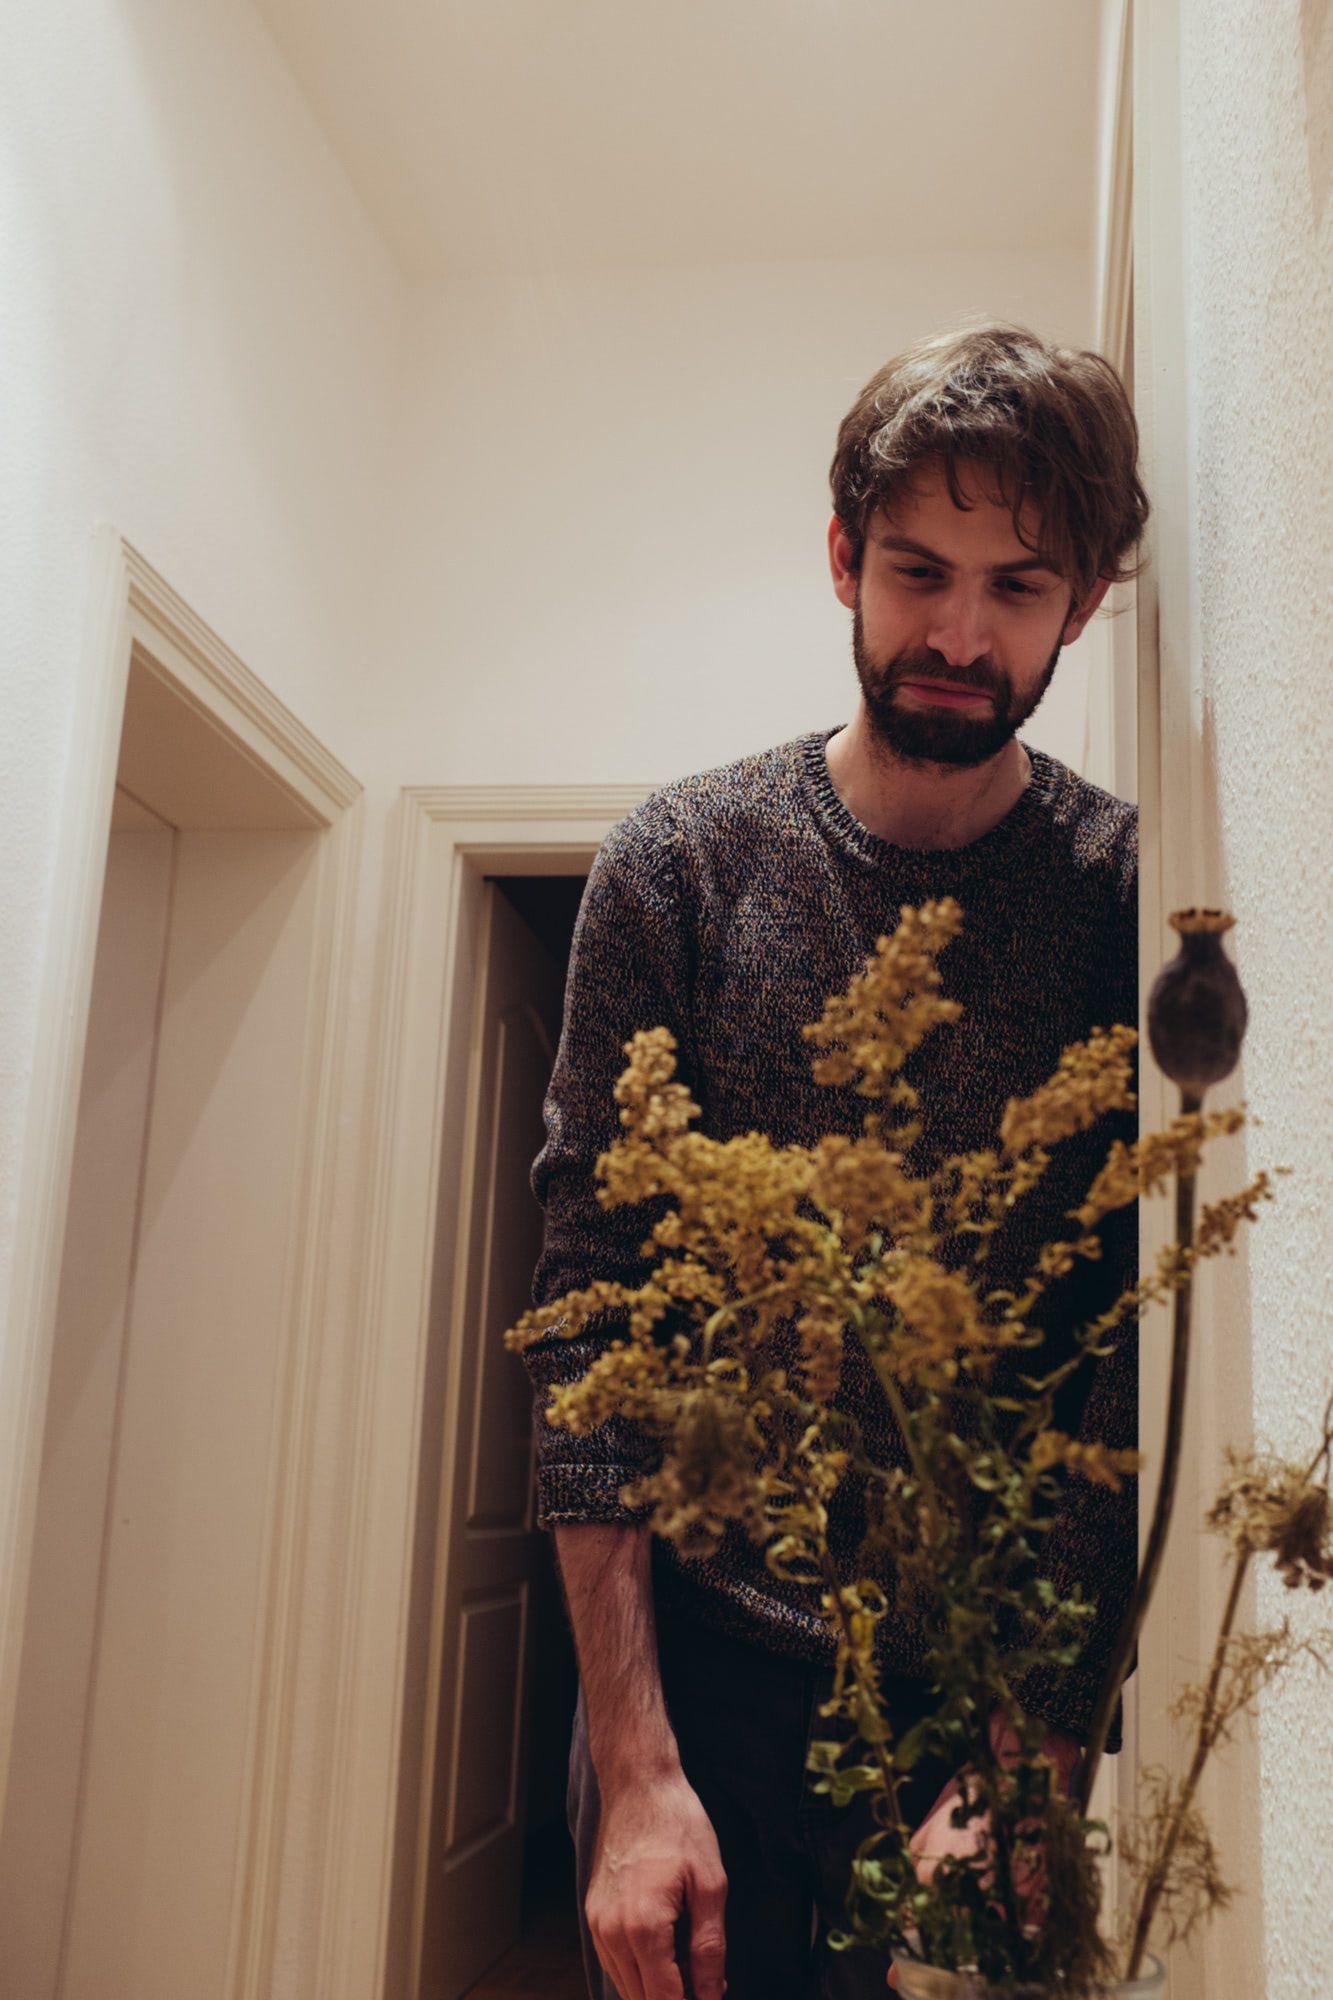 Life-affirming plant